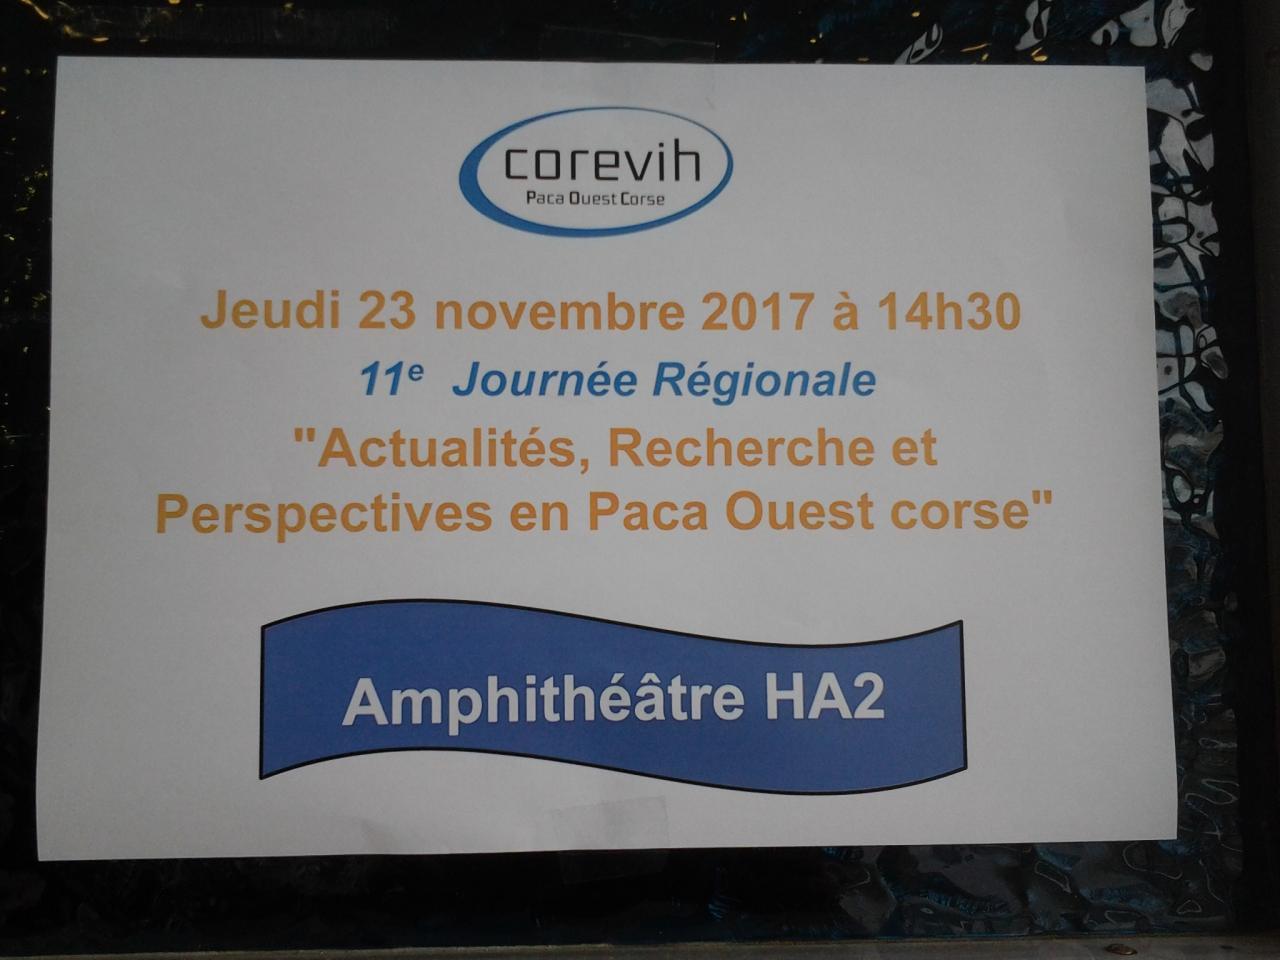 COREVIH, La timone, 23 septembre 2017.